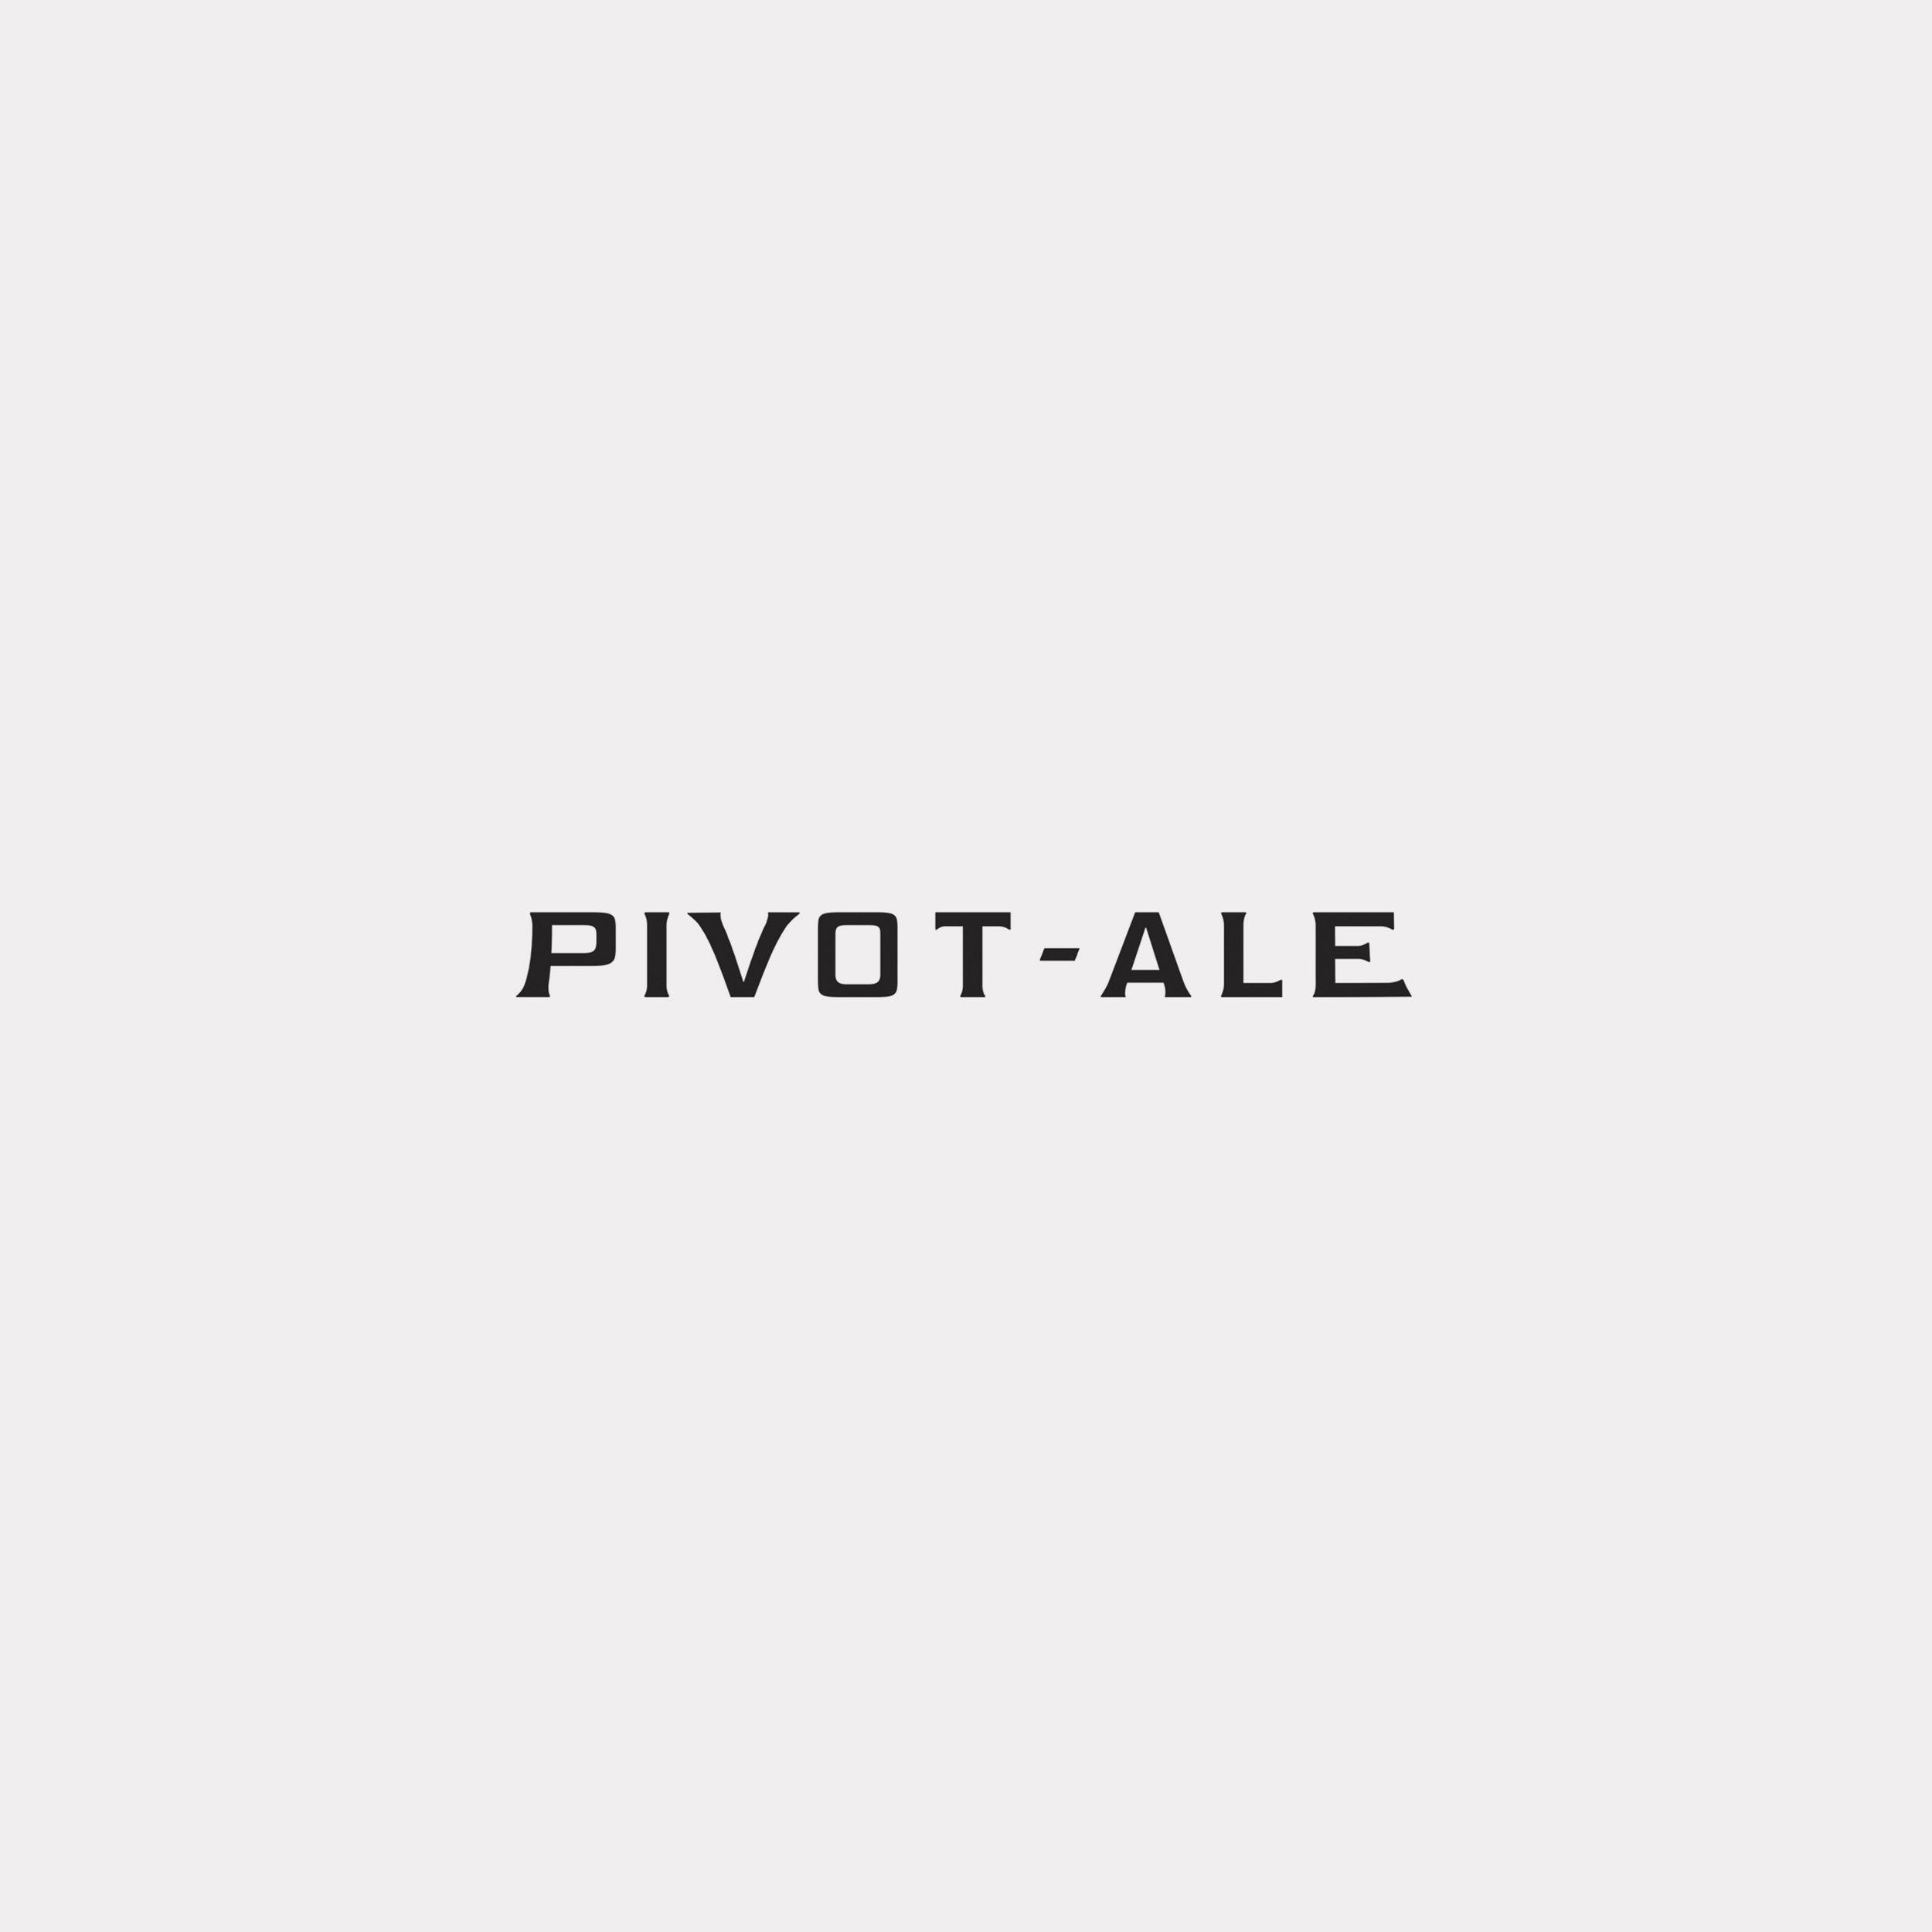 Mahr design_pivot_insta logo.jpg